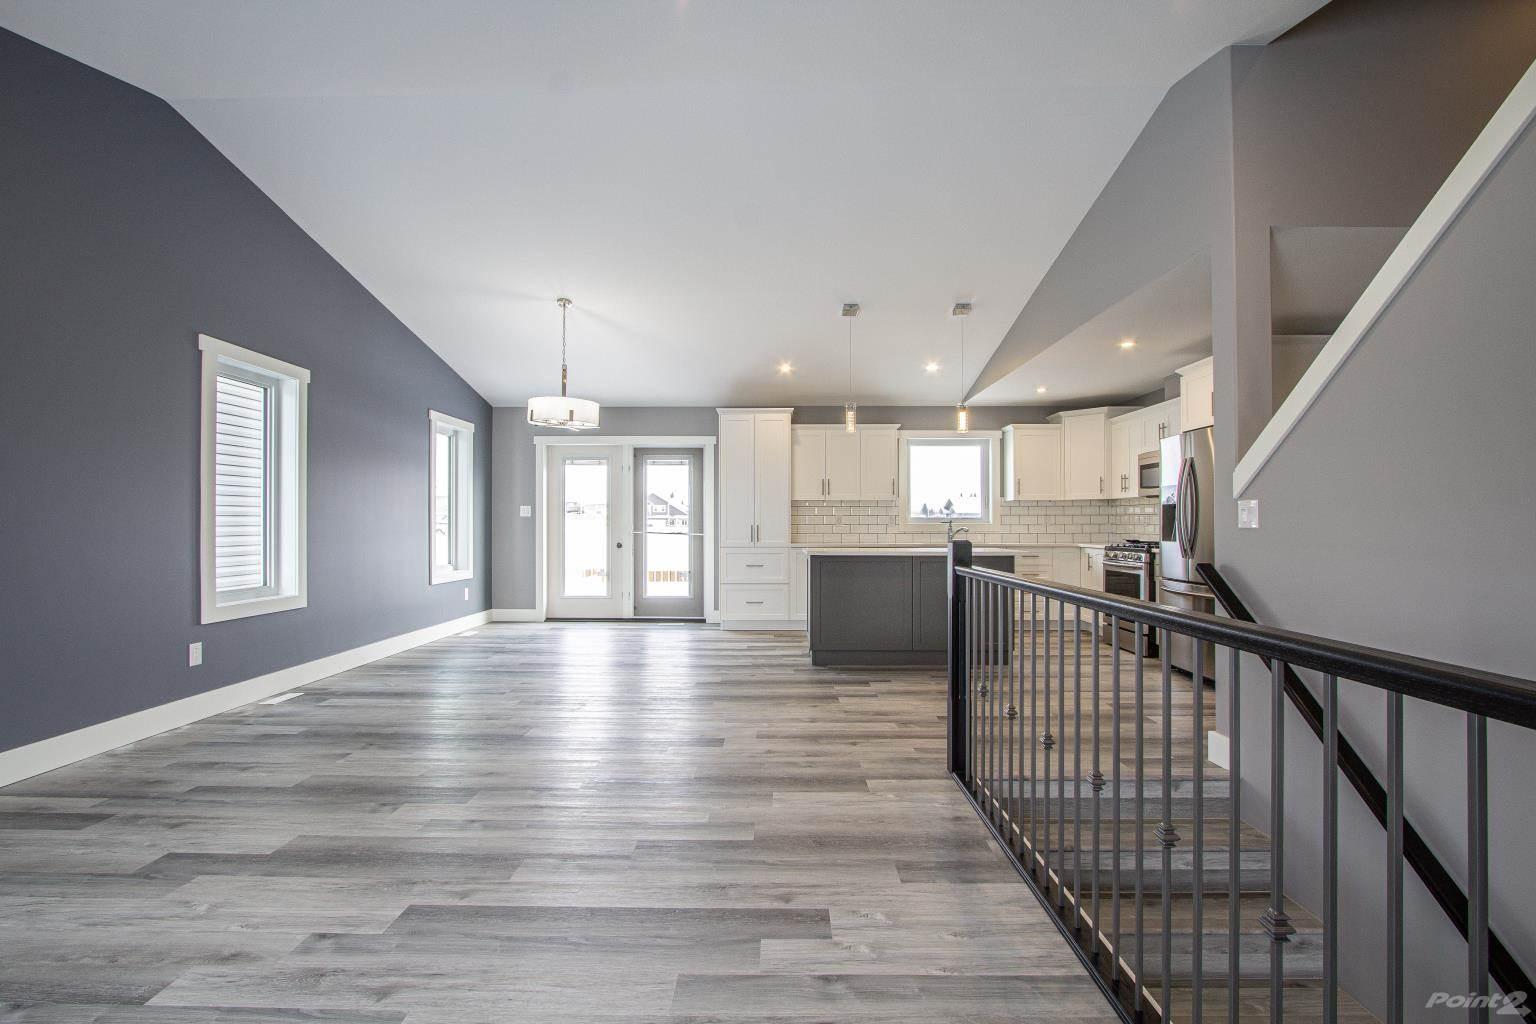 215 Terra Nova Cres in Cold Lake - House For Sale : MLS# e4225242 Photo 1